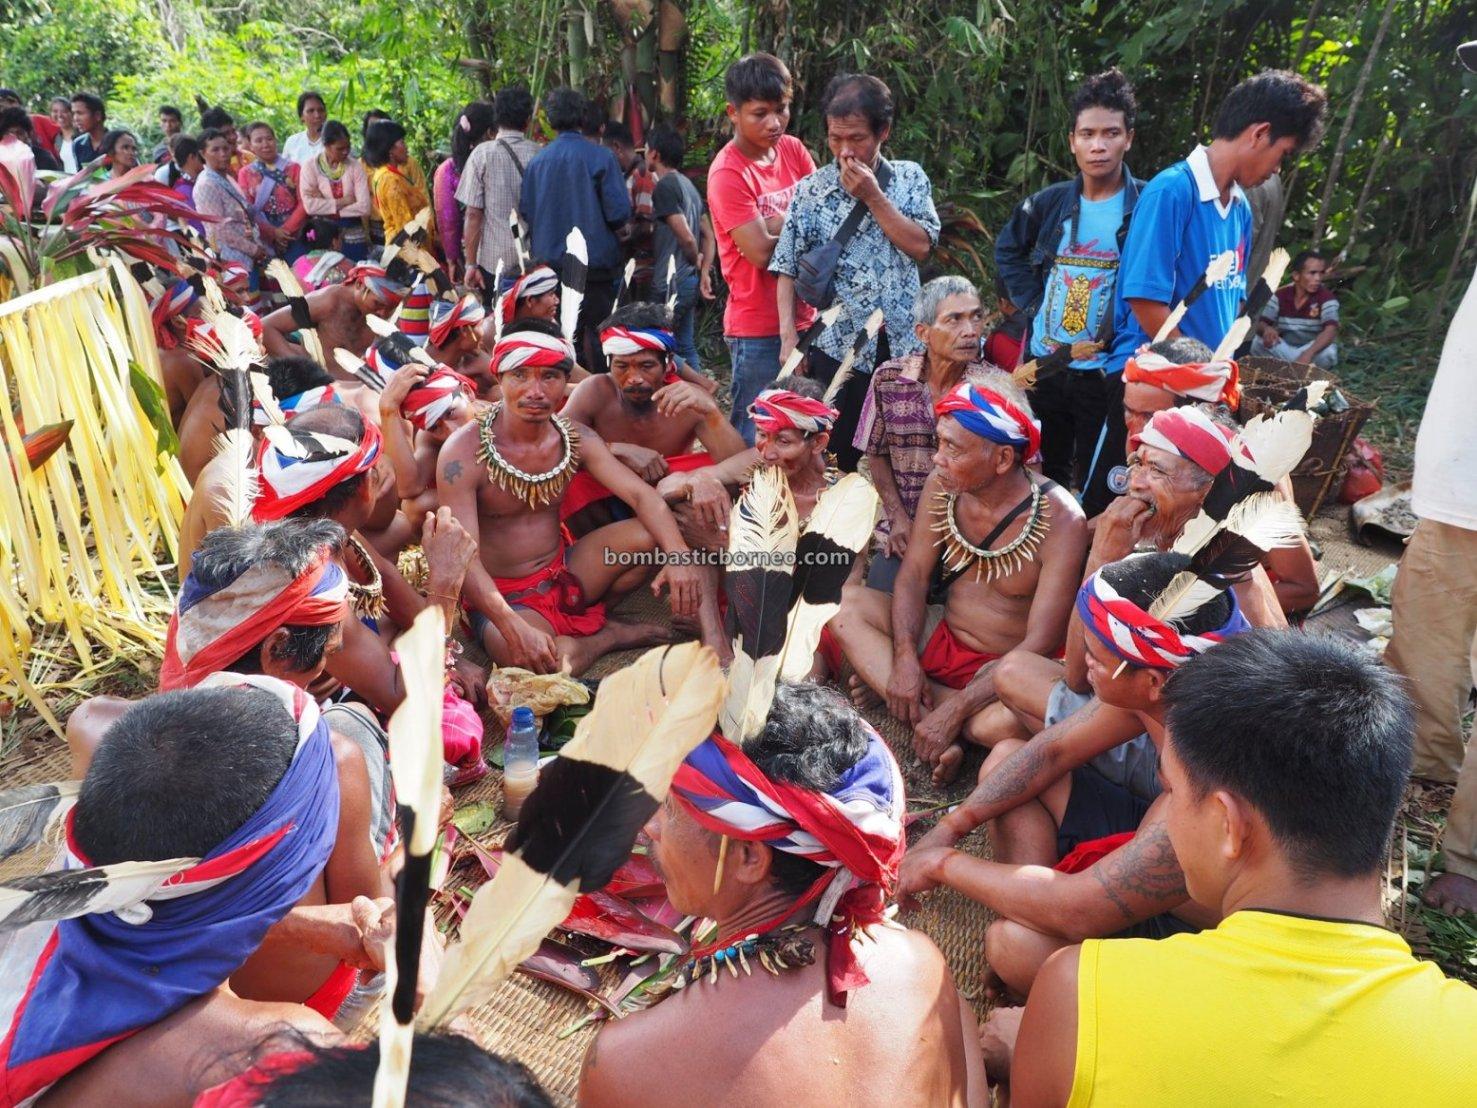 Nyobeng Rambai, Gawai Harvest Festival, authentic, village, backpackers, Dayak Bidayuh, Native, tribe, ritual, Tourism, travel guide, trans border, Borneo, 婆罗洲传统文化, 西加里曼丹孟加映, 印尼达雅丰收节日